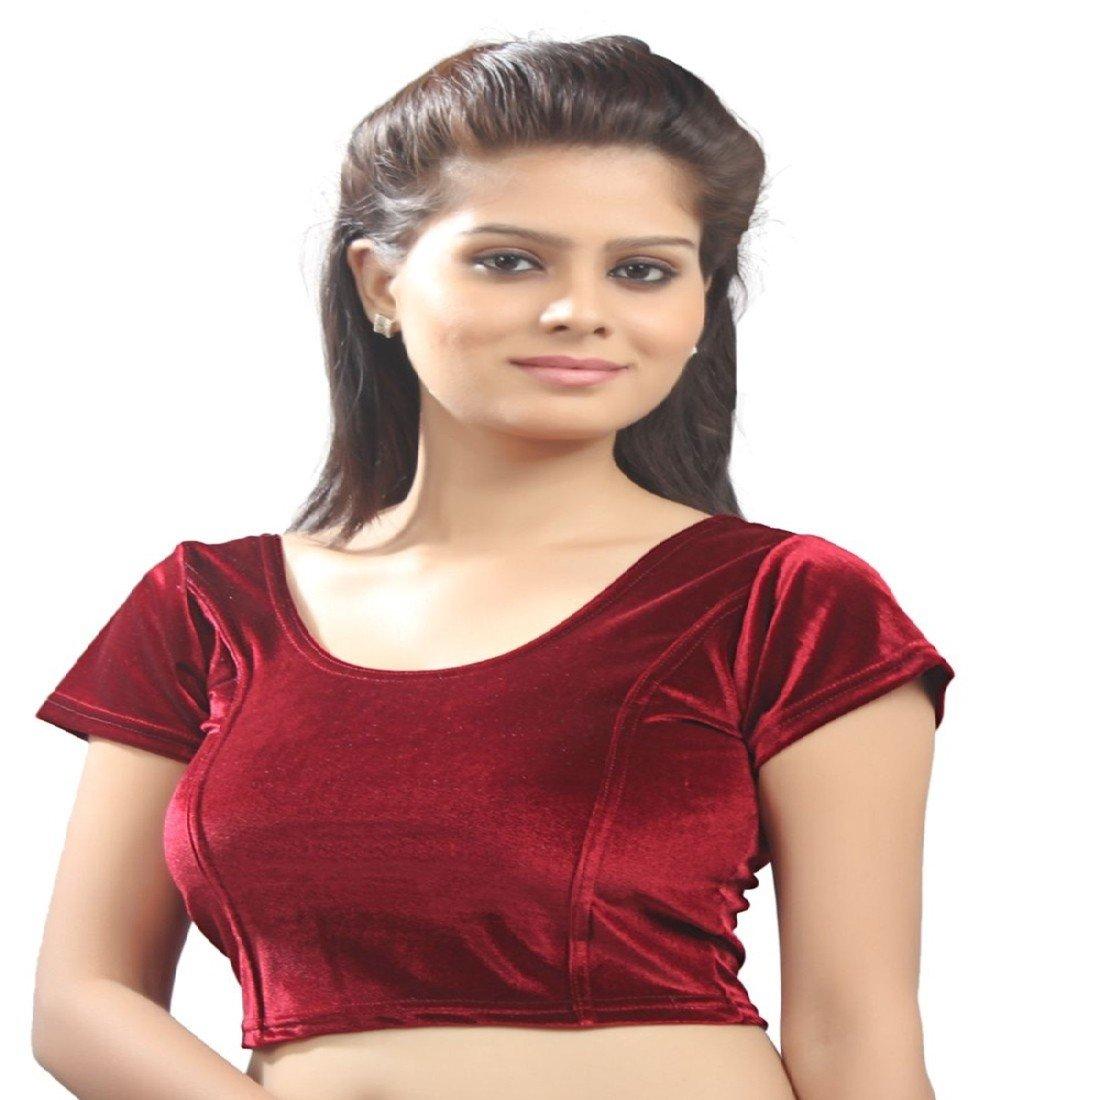 fdcb40f1c7b822 Biyu Maroon Cap Sleeve U-Neck Cotton Lycra Velvet stretchable Readymade  saree Blouse(RR045)  Amazon.in  Clothing   Accessories